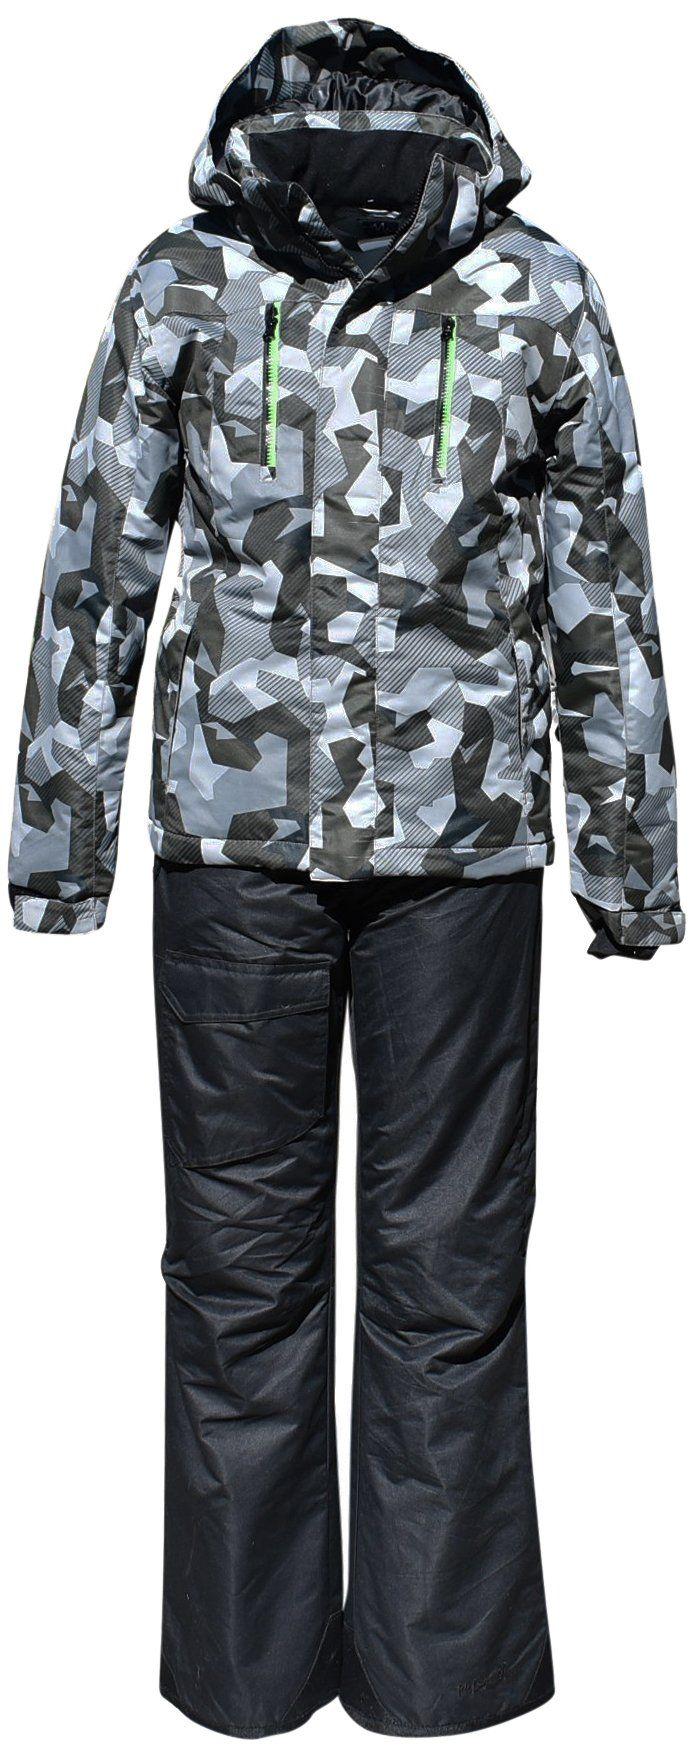 fa0a1ac0a5b0 Pulse Big Boys Youth Kids Insulated Snowsuit Jacket Pants Terrain ...